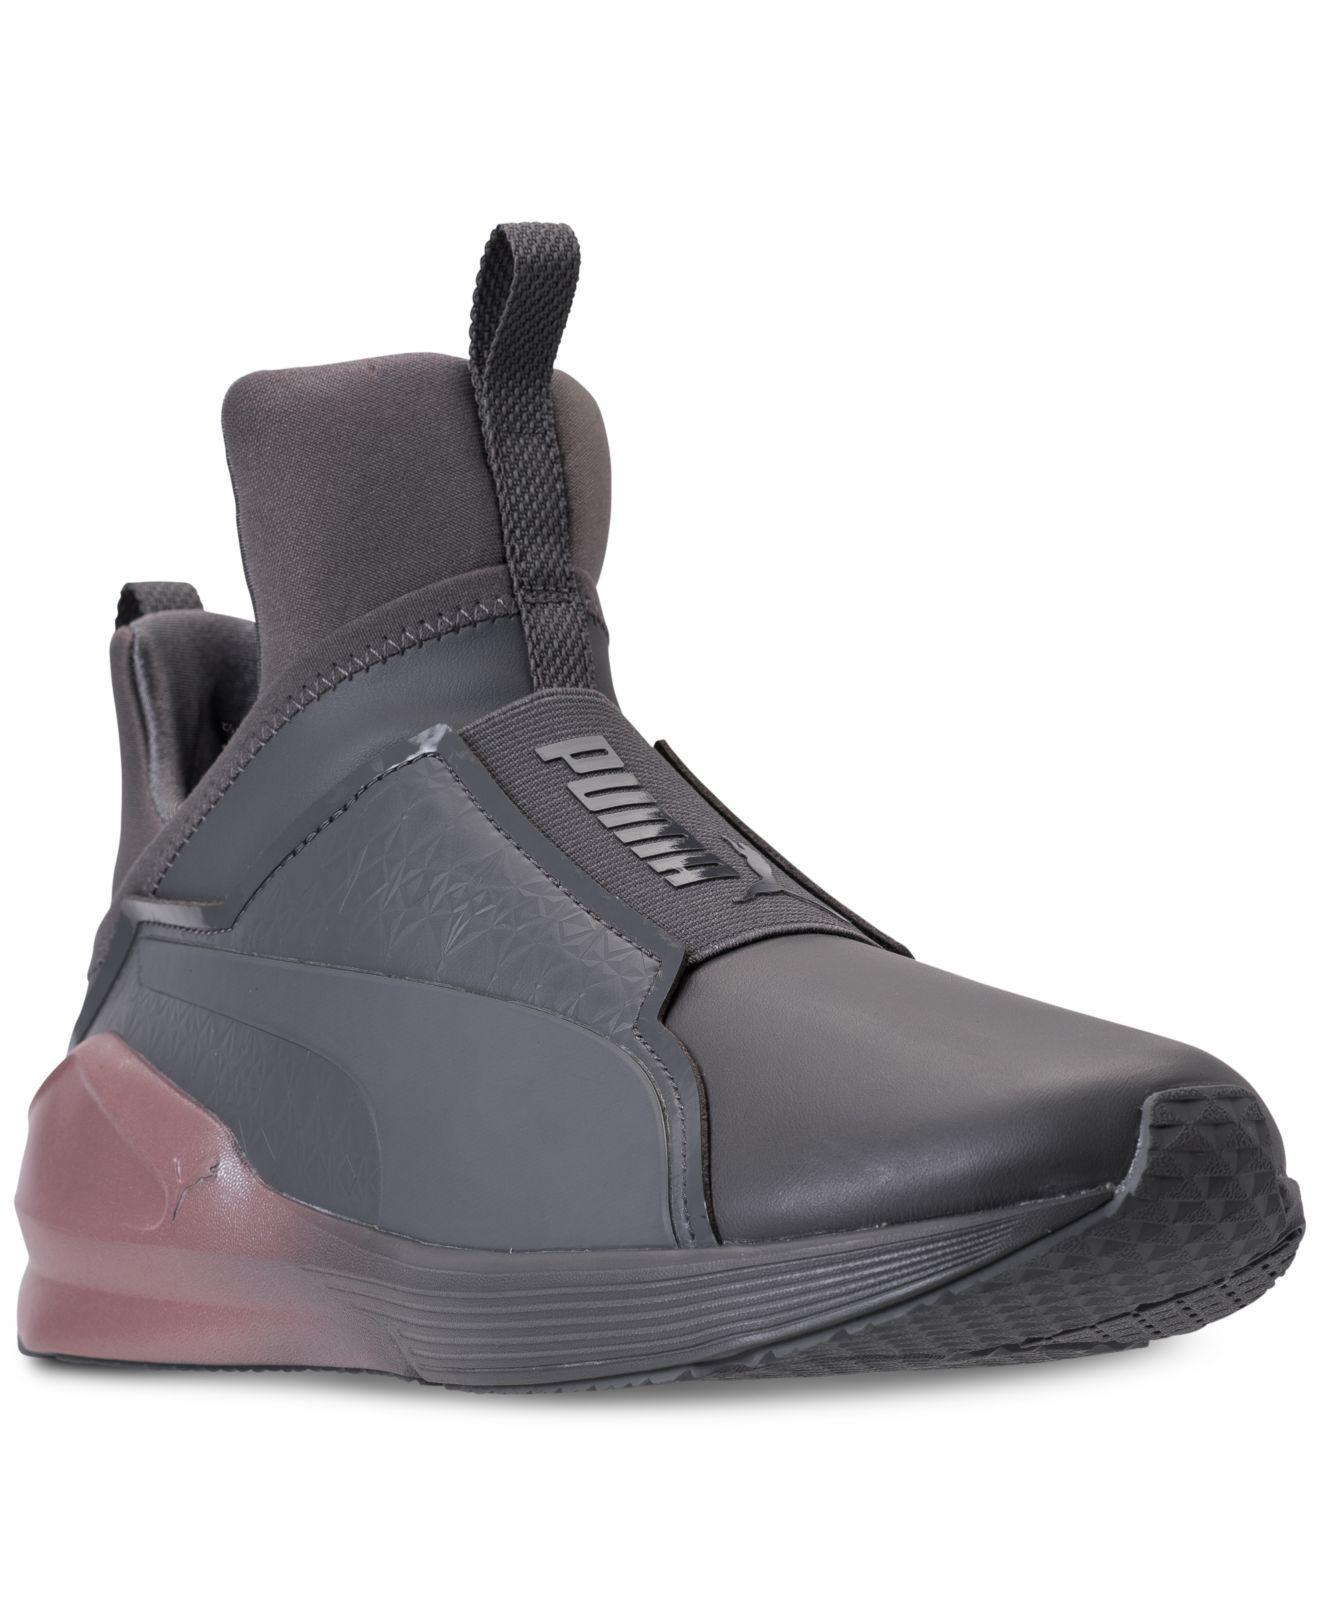 116fa1e9f7eae9 Lyst - PUMA Women s Fierce Chalet Casual Sneakers From Finish Line ...